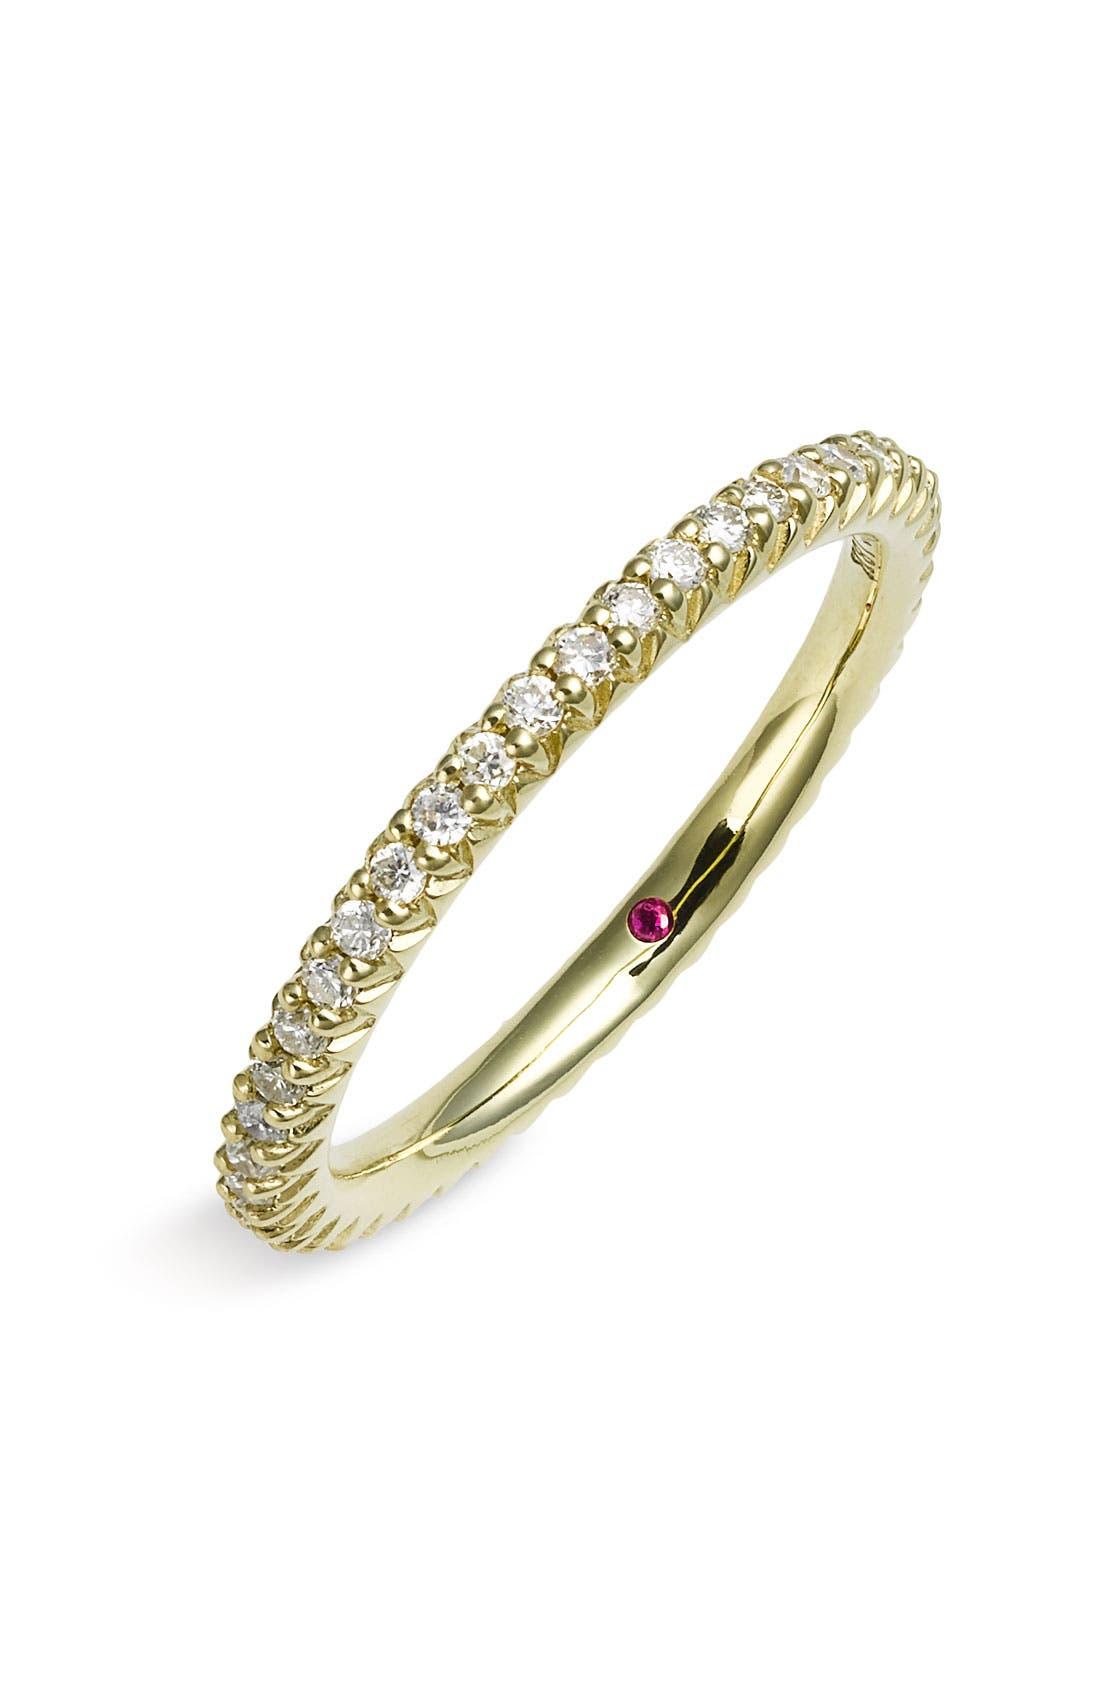 Alternate Image 1 Selected - Roberto Coin 'Micropavé' Diamond Stackable Ring